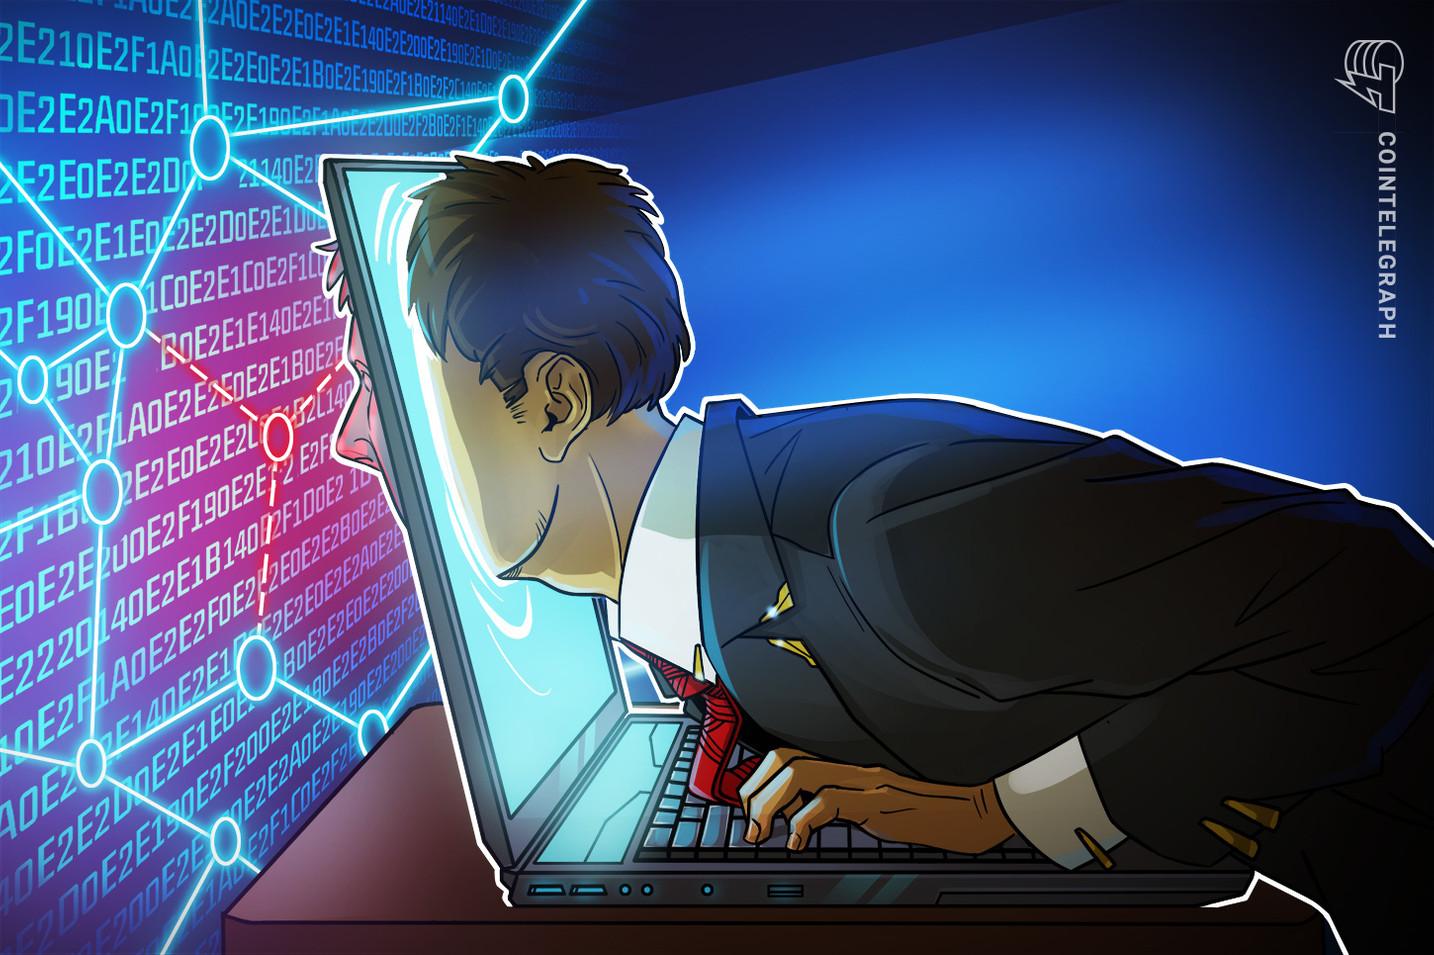 El desarrollador de LN de Bitcoin revela vulnerabilidad de la red